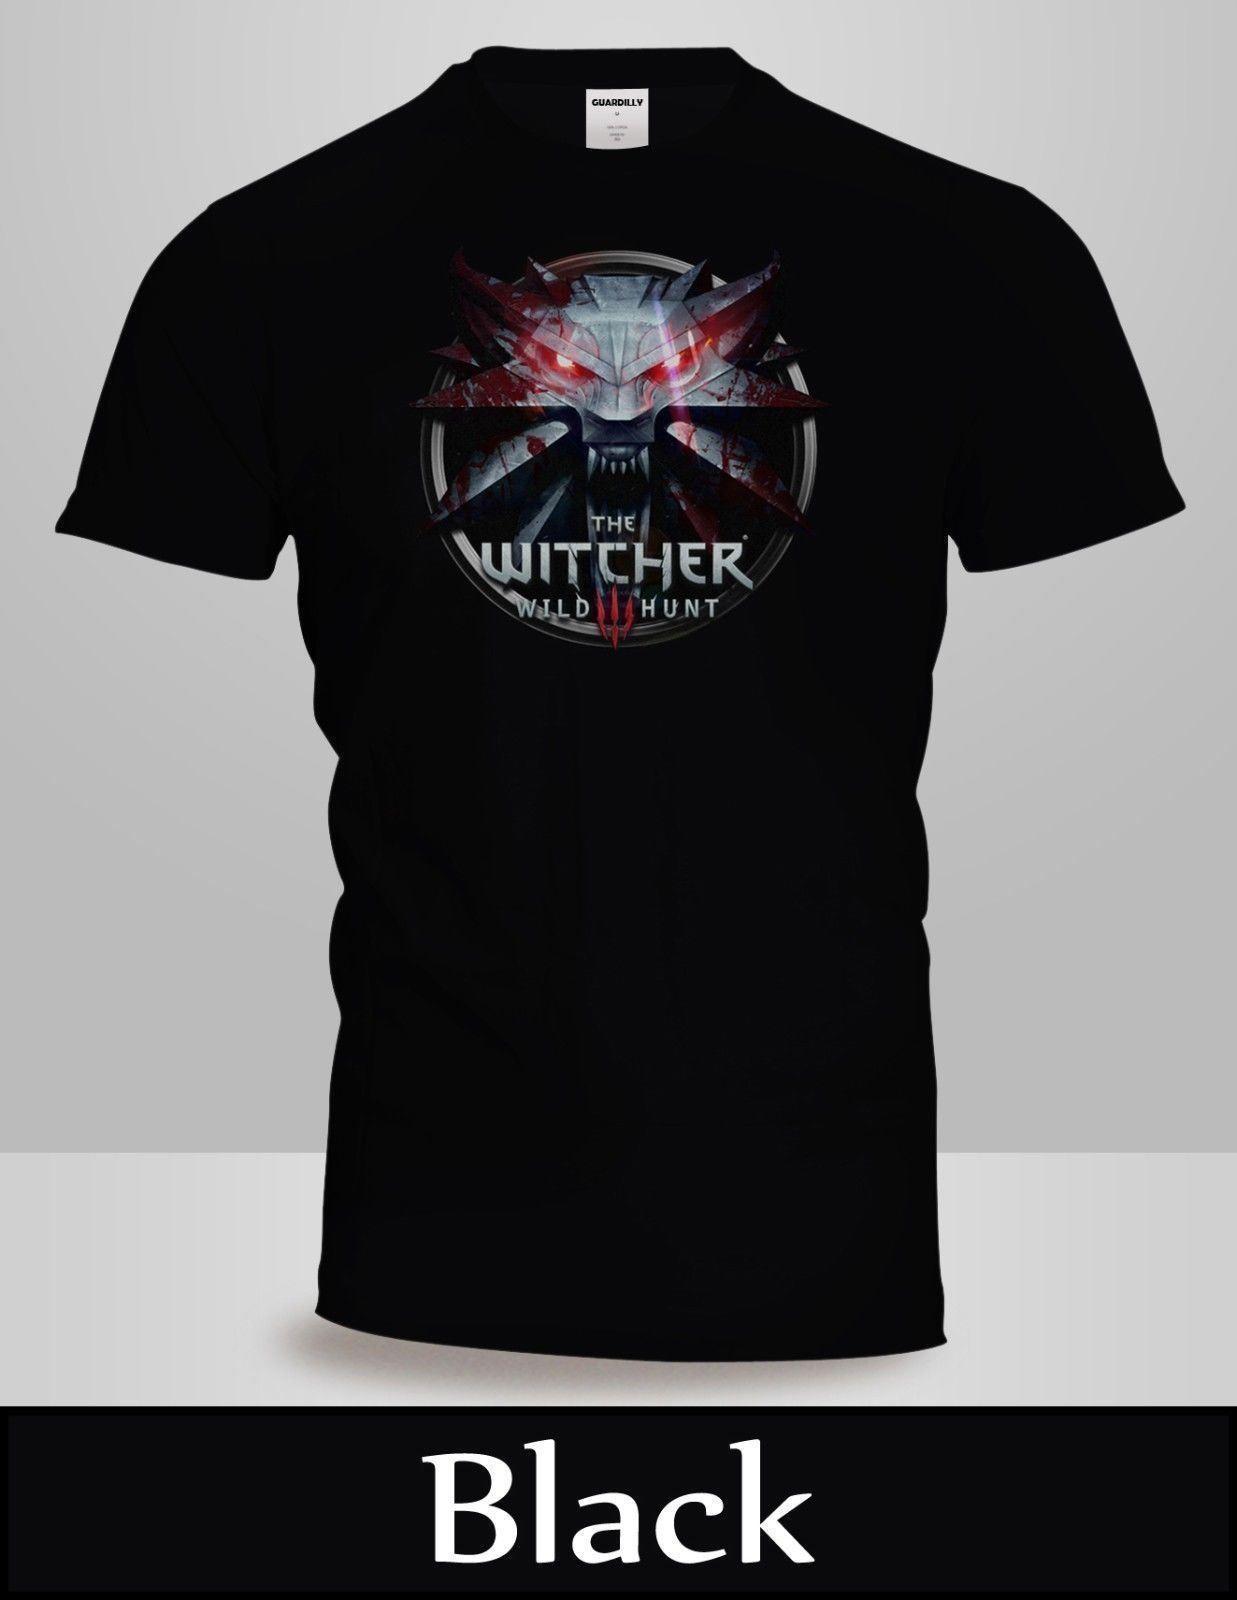 ba75fdd9c0 The Witcher 3 Wild Hunt Logo T Shirt Logo Funny Unisex Casual Tshirt Top  Cool T Shirts Buy Online Raid Shirt From Thebestoree, $12.96| DHgate.Com